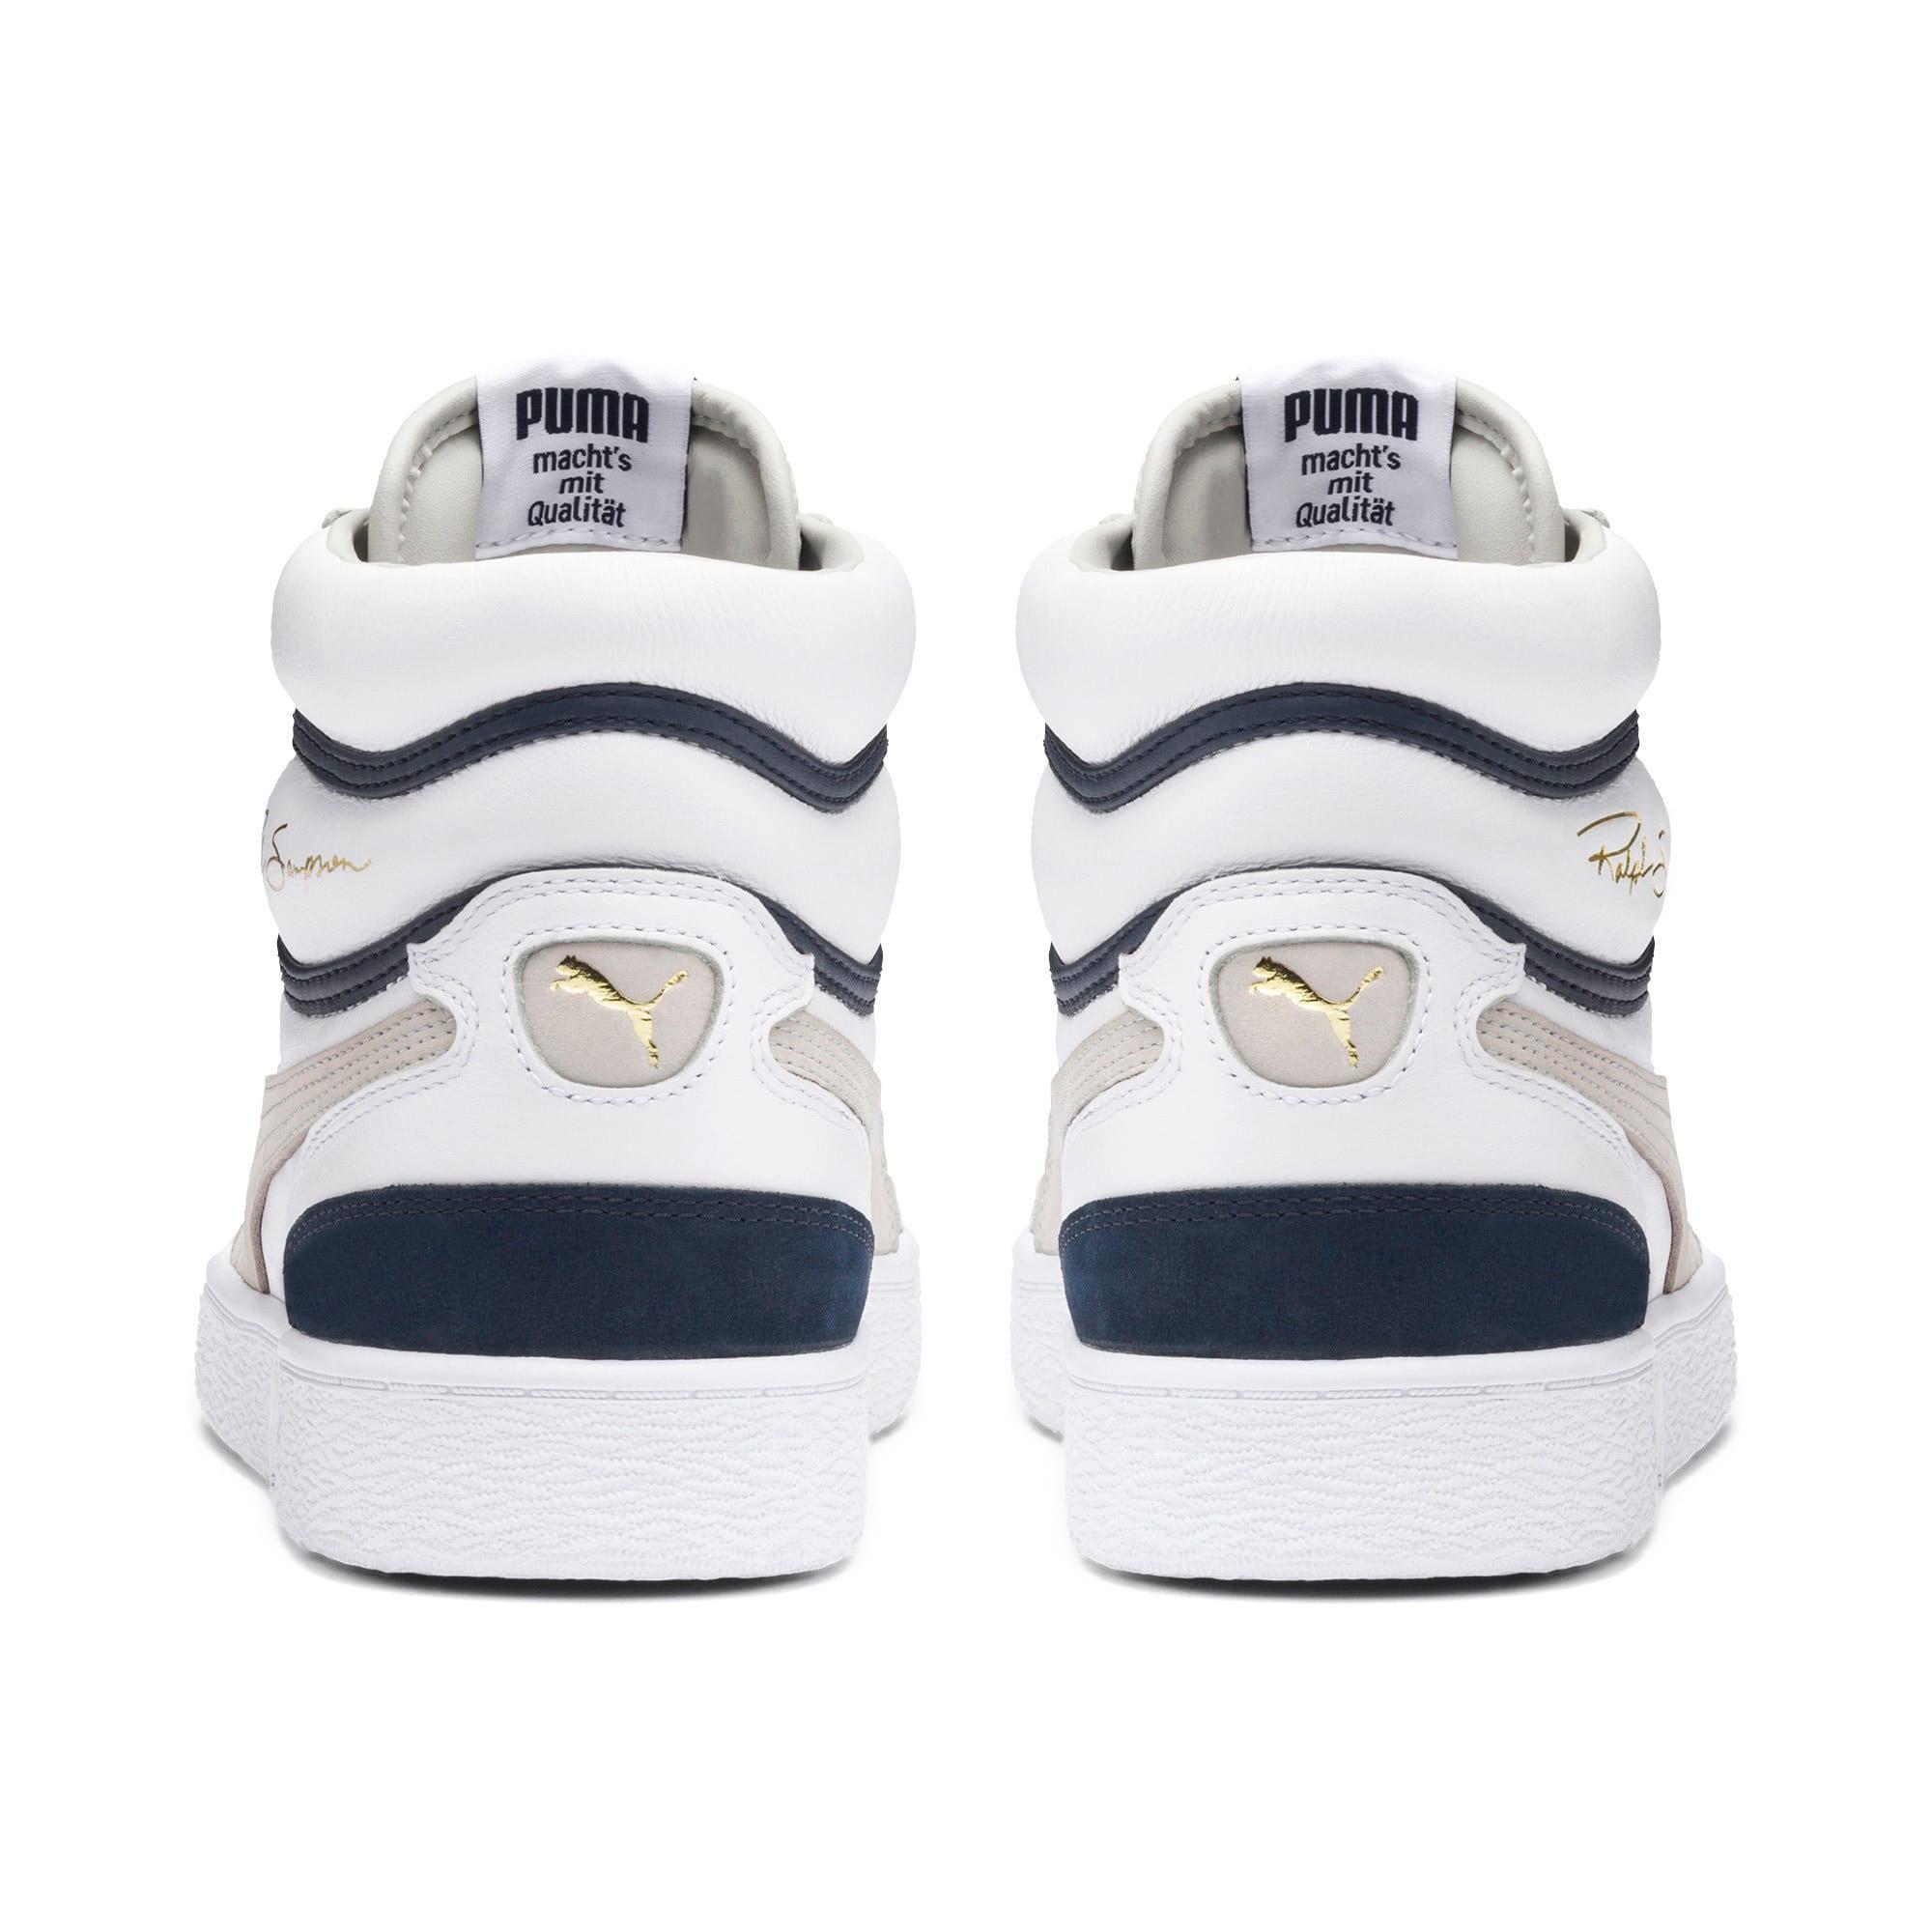 Miniatura 3 de Zapatos deportivos de caña media Ralph Sampson OG, Puma Wht-Gray Violet-Peacoat, mediano